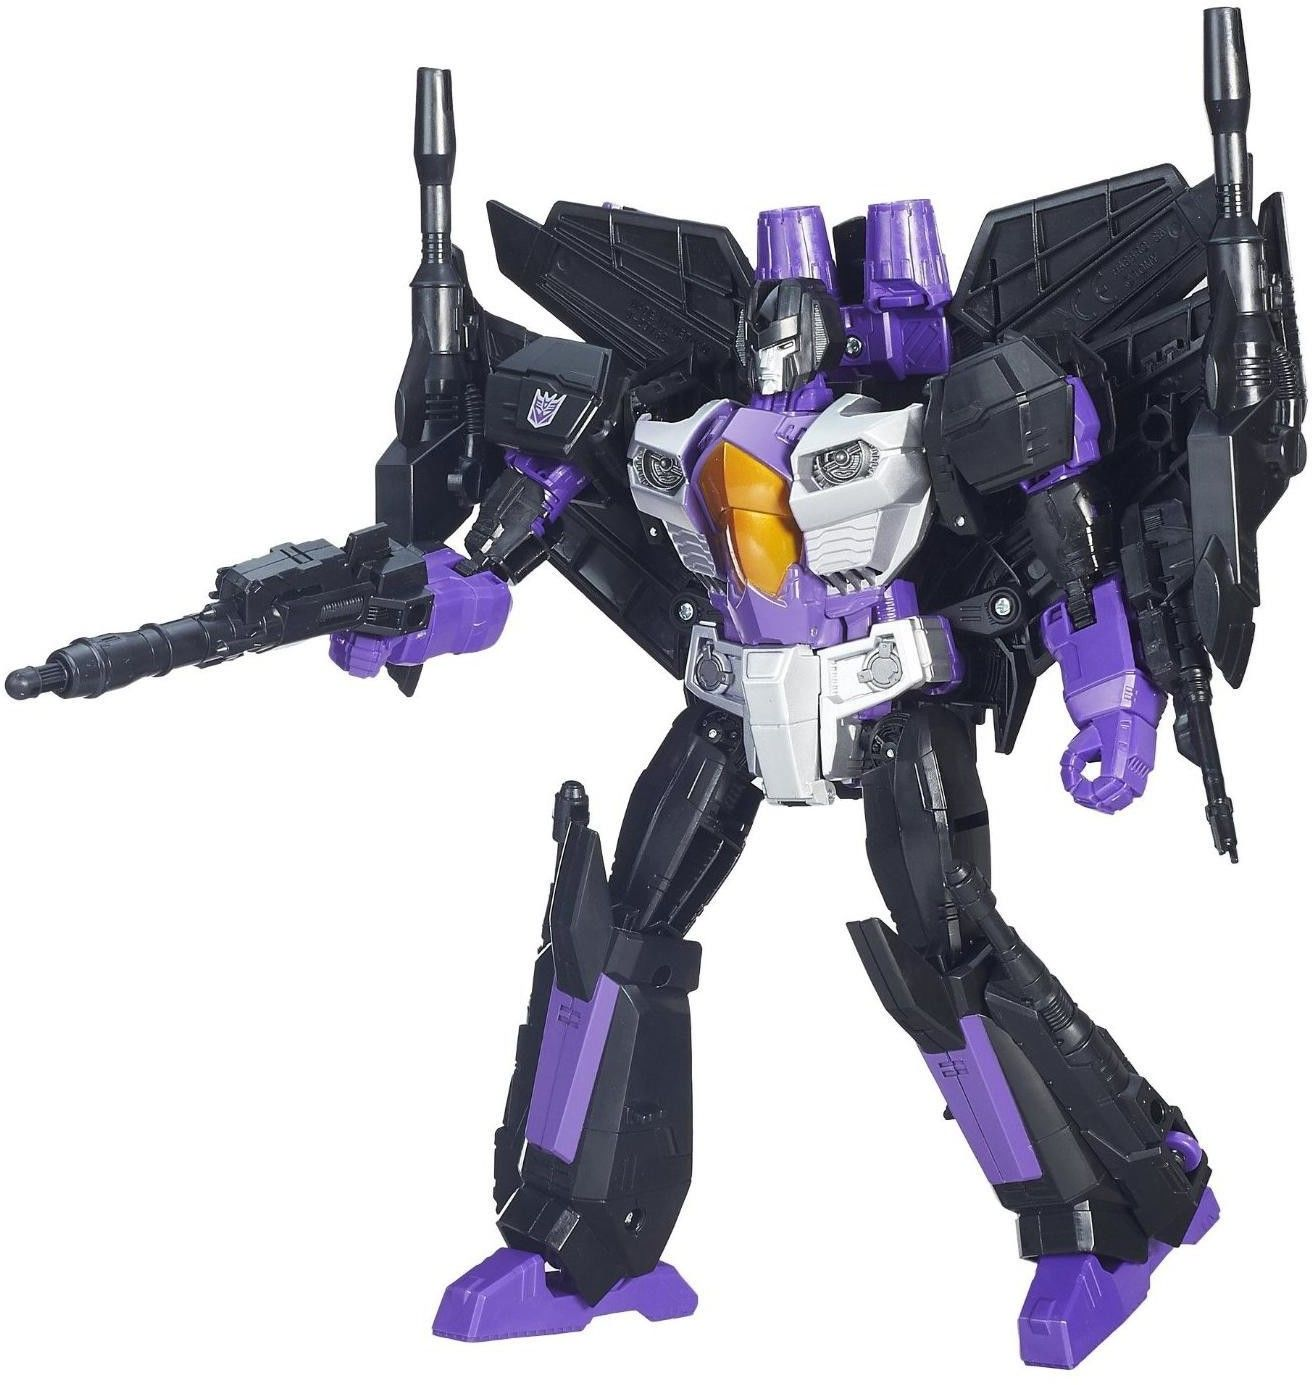 Hasbro - Transformers Generations Legends Mega Leader Skywarp 24 cm. B4669 B0972